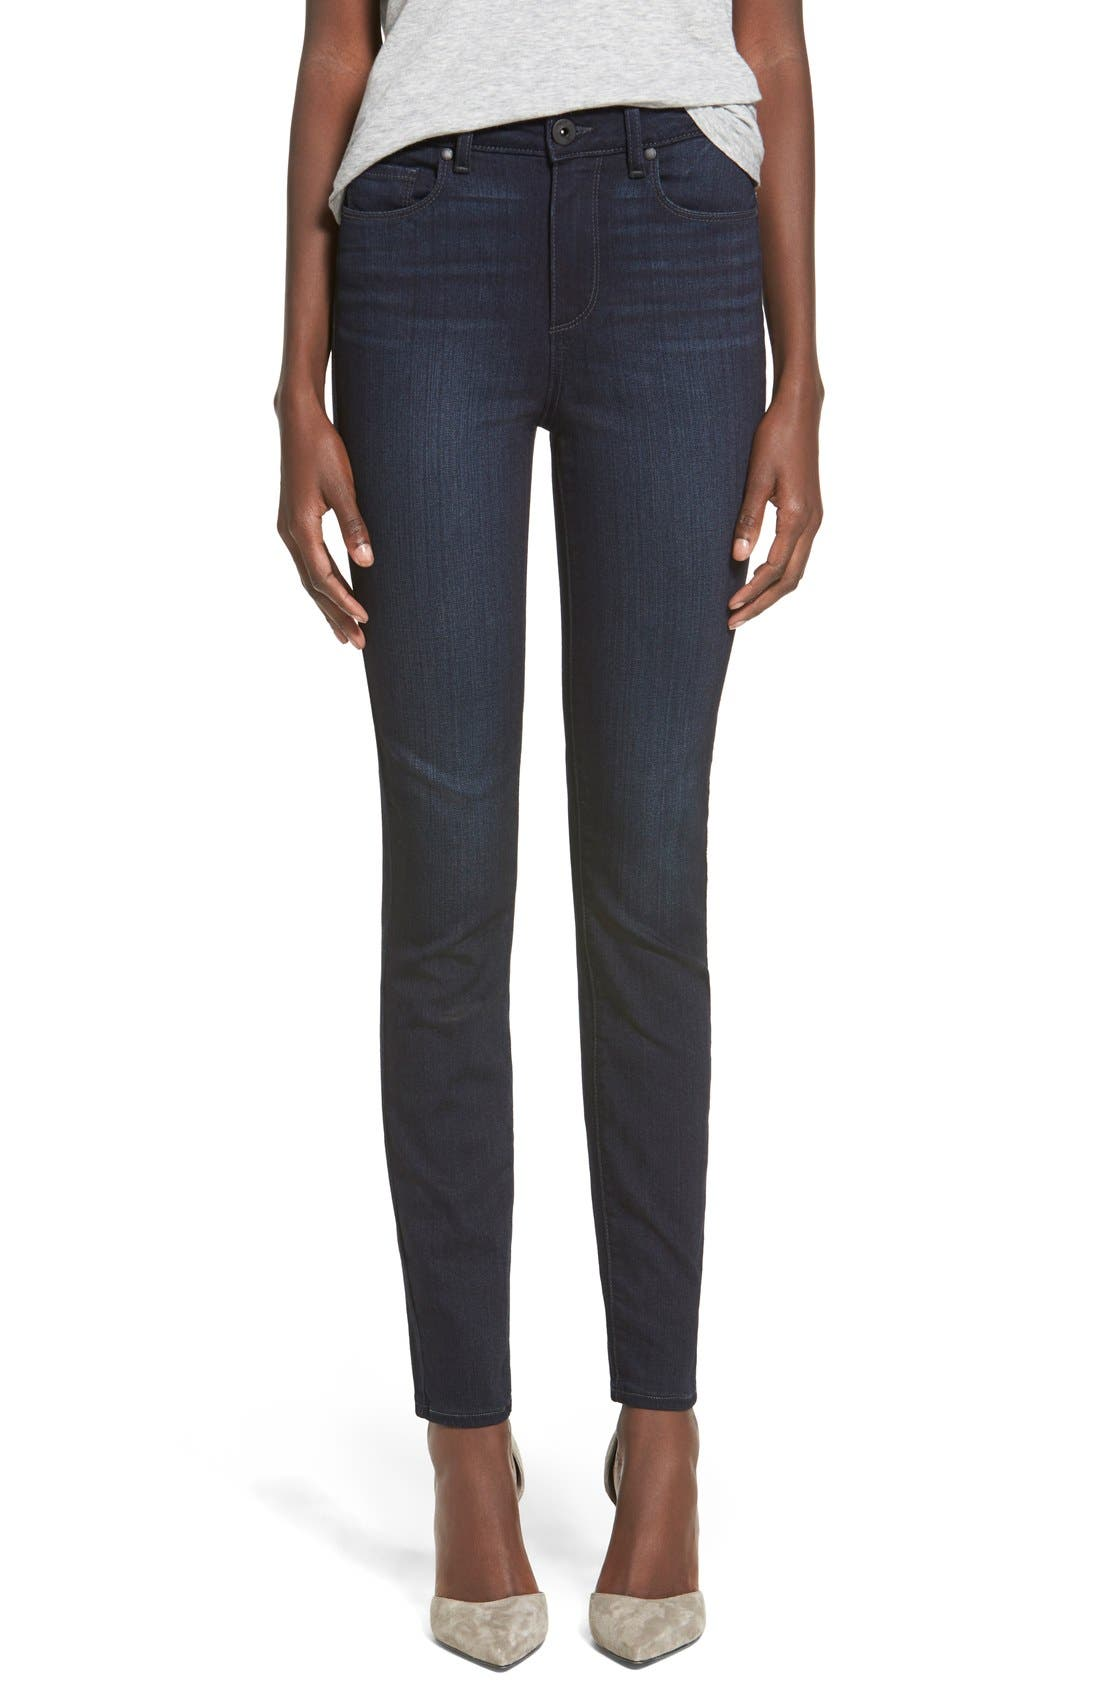 Denim 'Transcend - Hoxton' High Rise Ankle Skinny Jeans,                             Main thumbnail 1, color,                             400